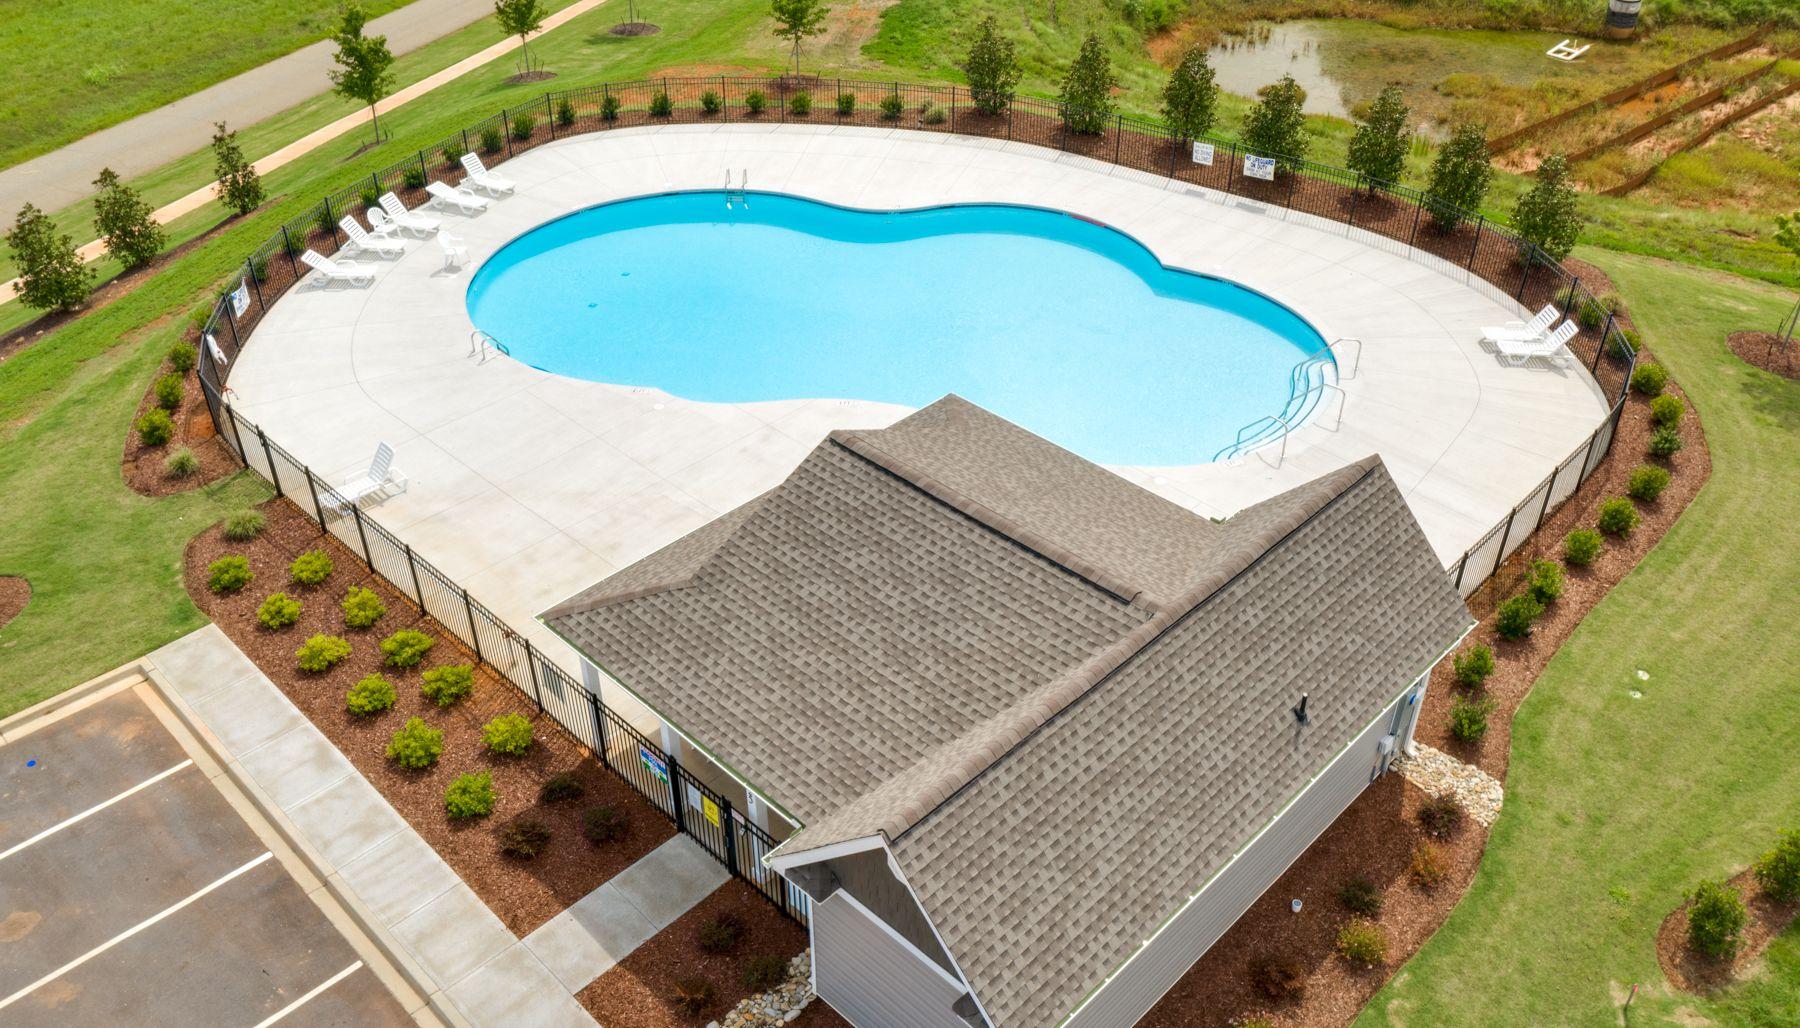 'Creekside Manor' by Dan Ryan - Greenville Region in Greenville-Spartanburg